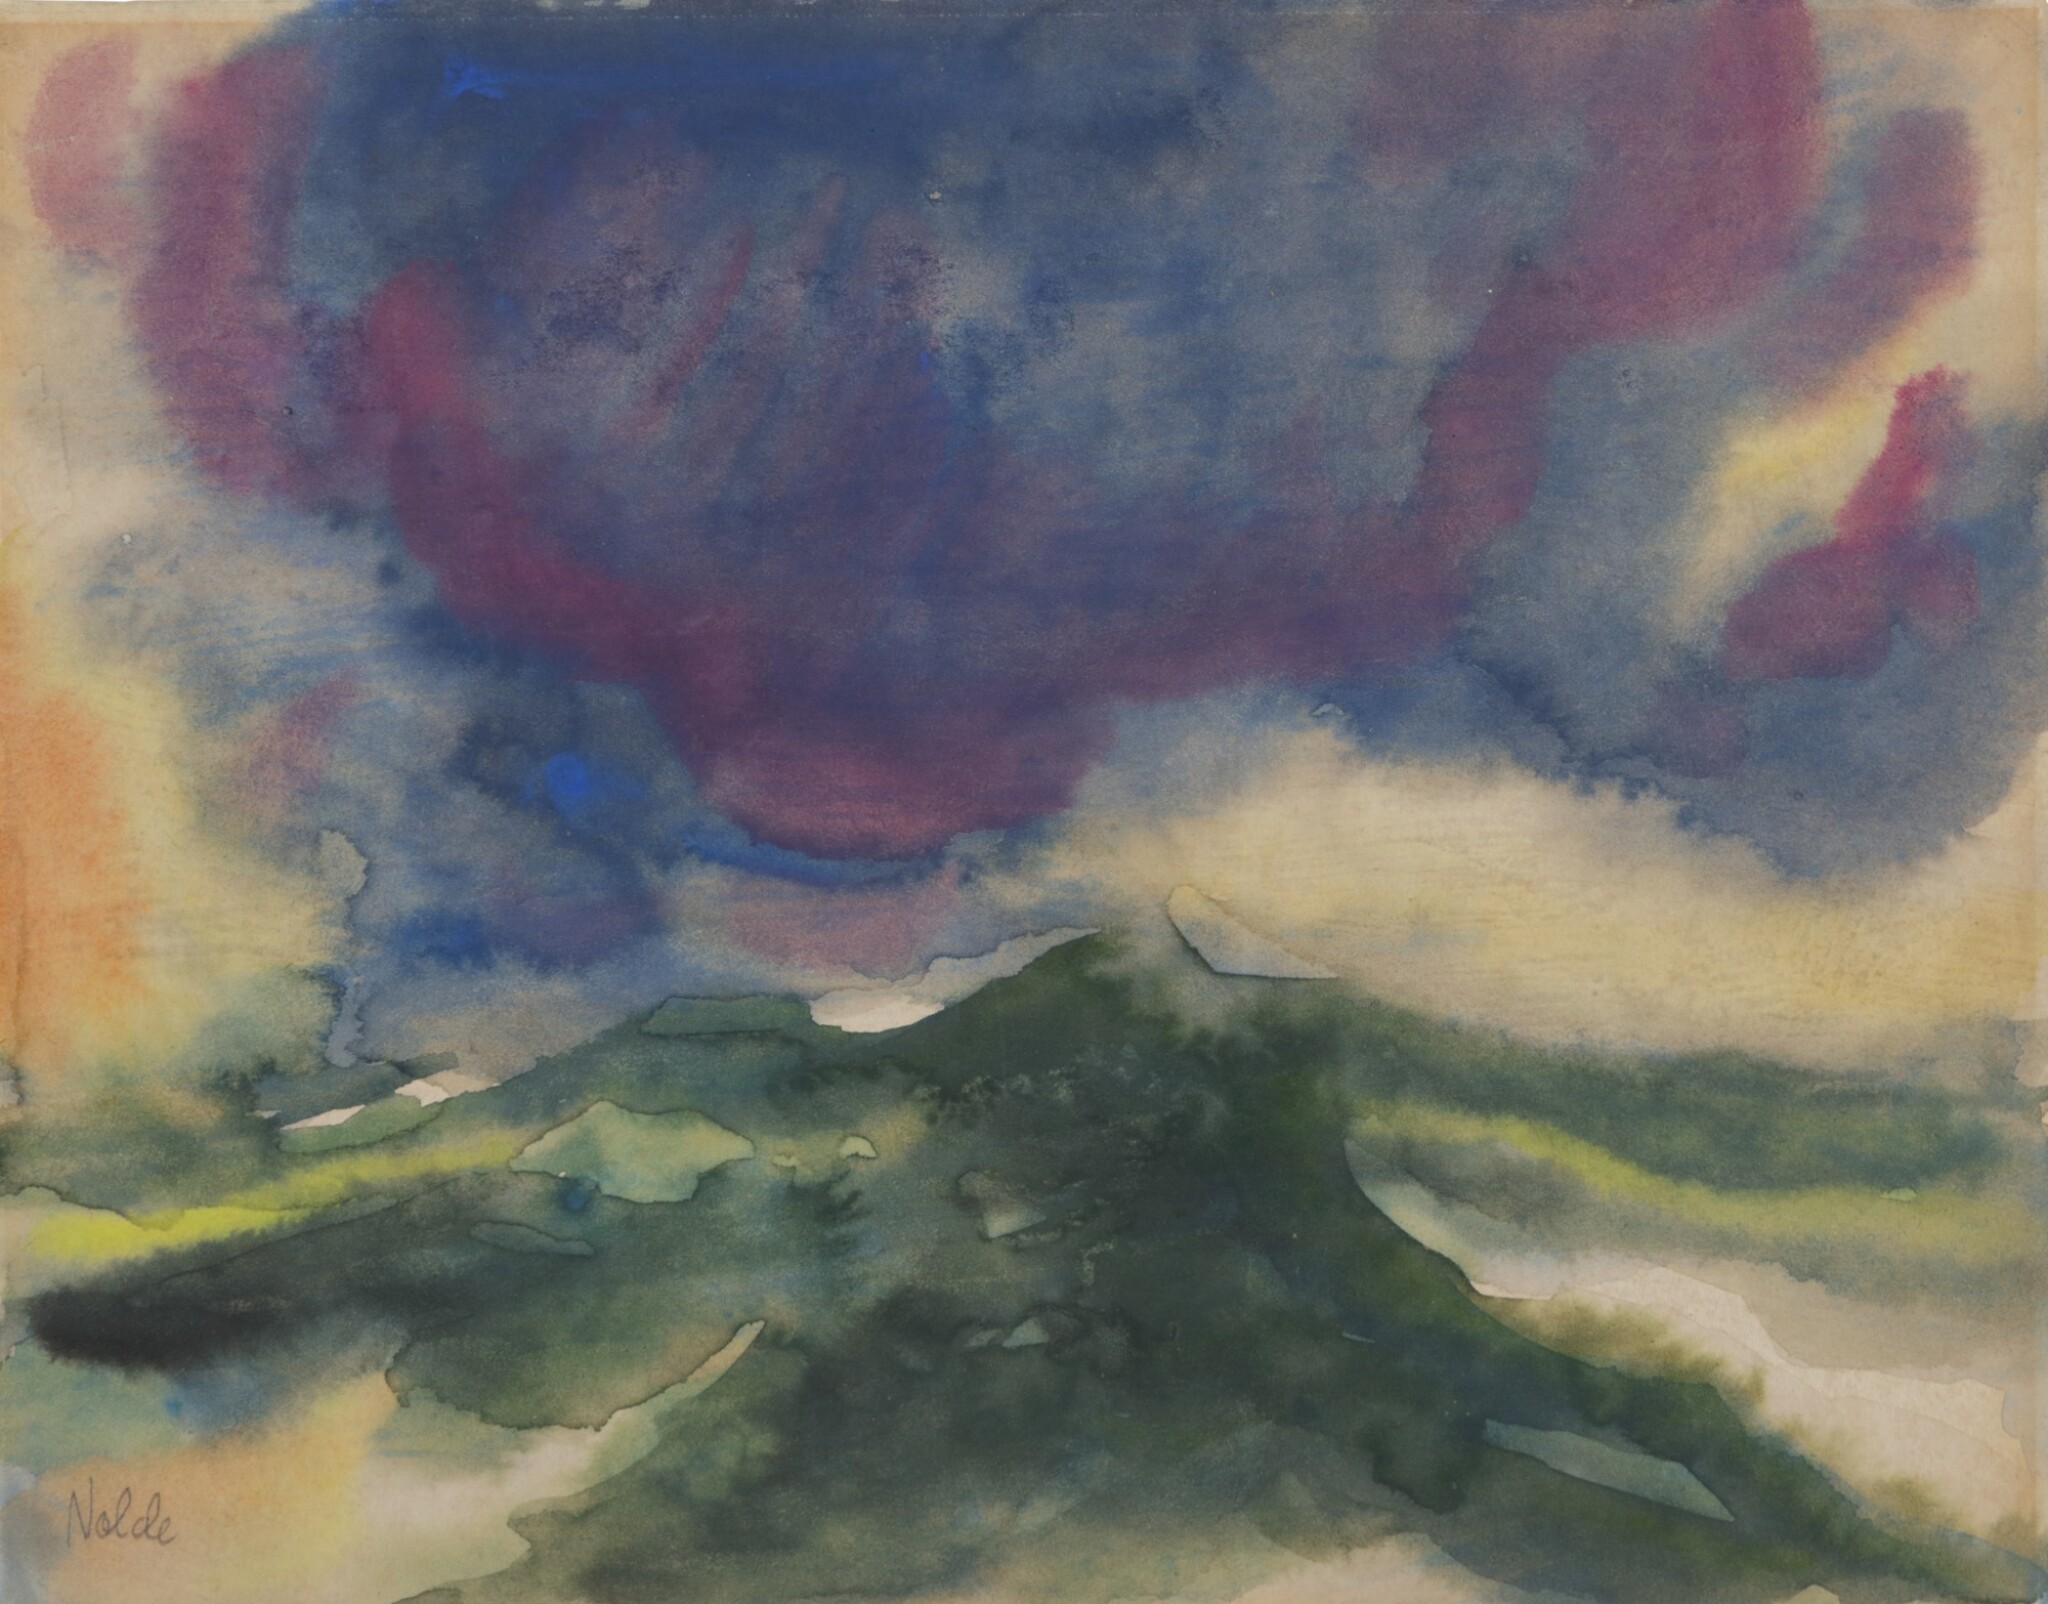 View full screen - View 1 of Lot 21. Landschaft unter einer grossen, blauen Wolke (Landscape under a Big Blue Cloud) .